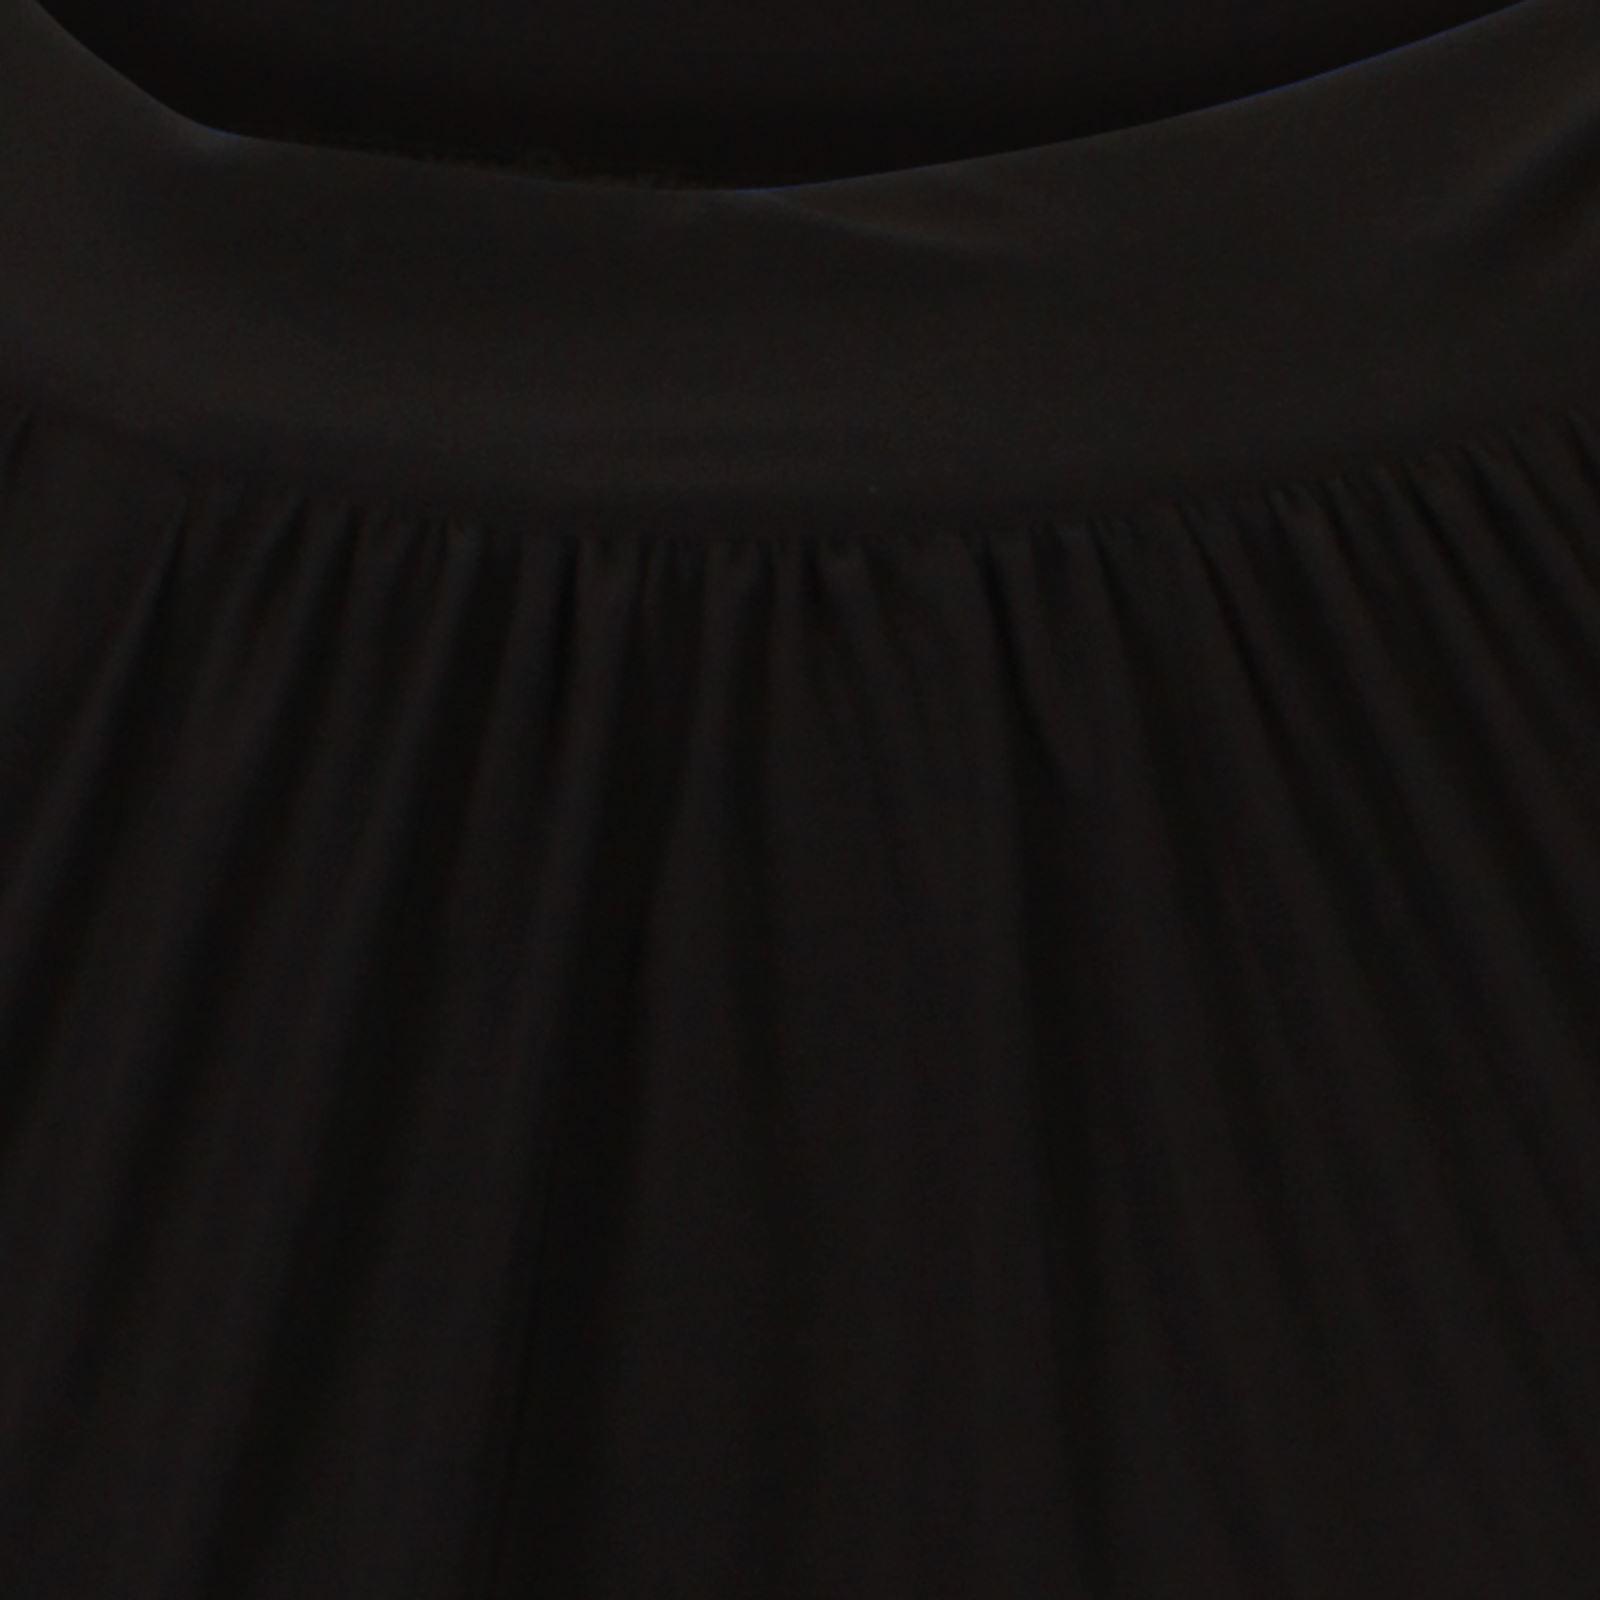 New Womens Halter Neck Ties Chiffon Blouse Gathering Hem Top 8-22